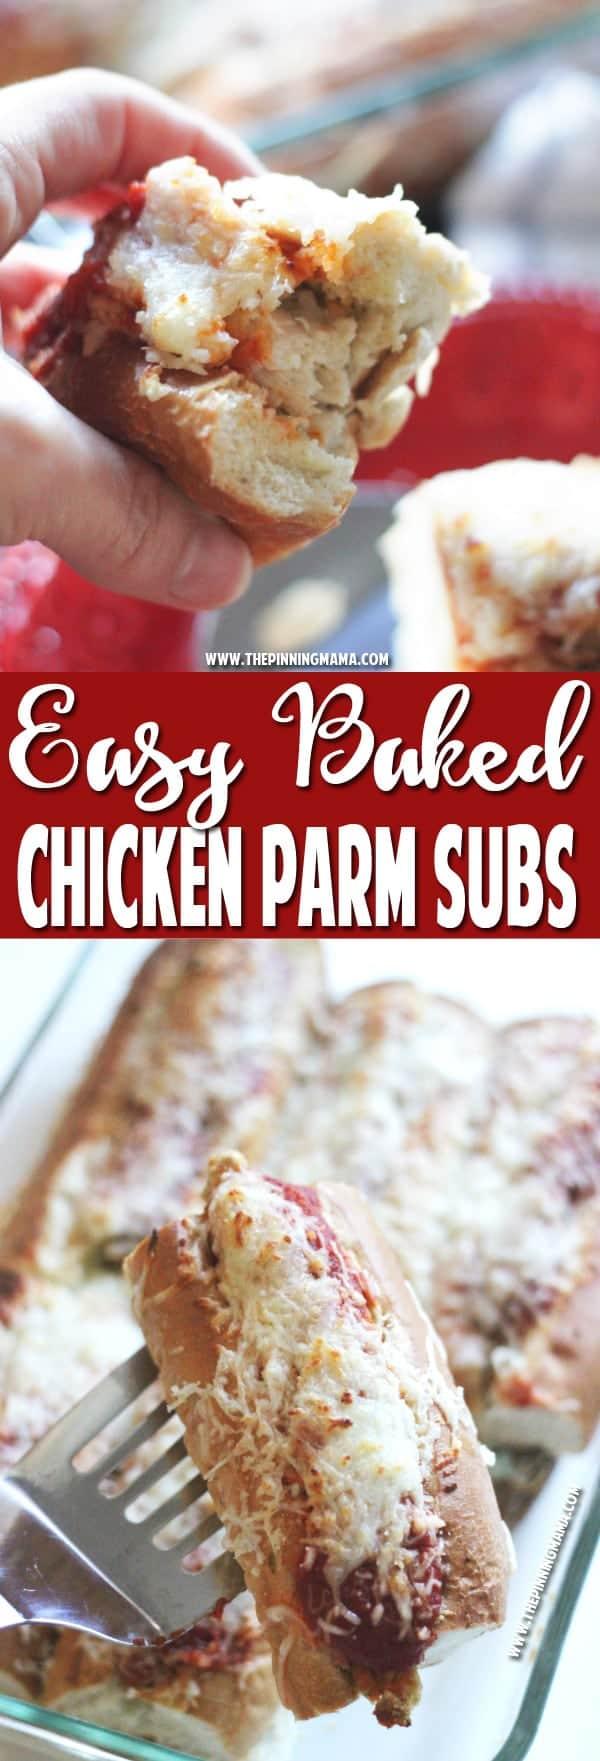 Baked Chicken Parmesan Sandwich recipe 5w